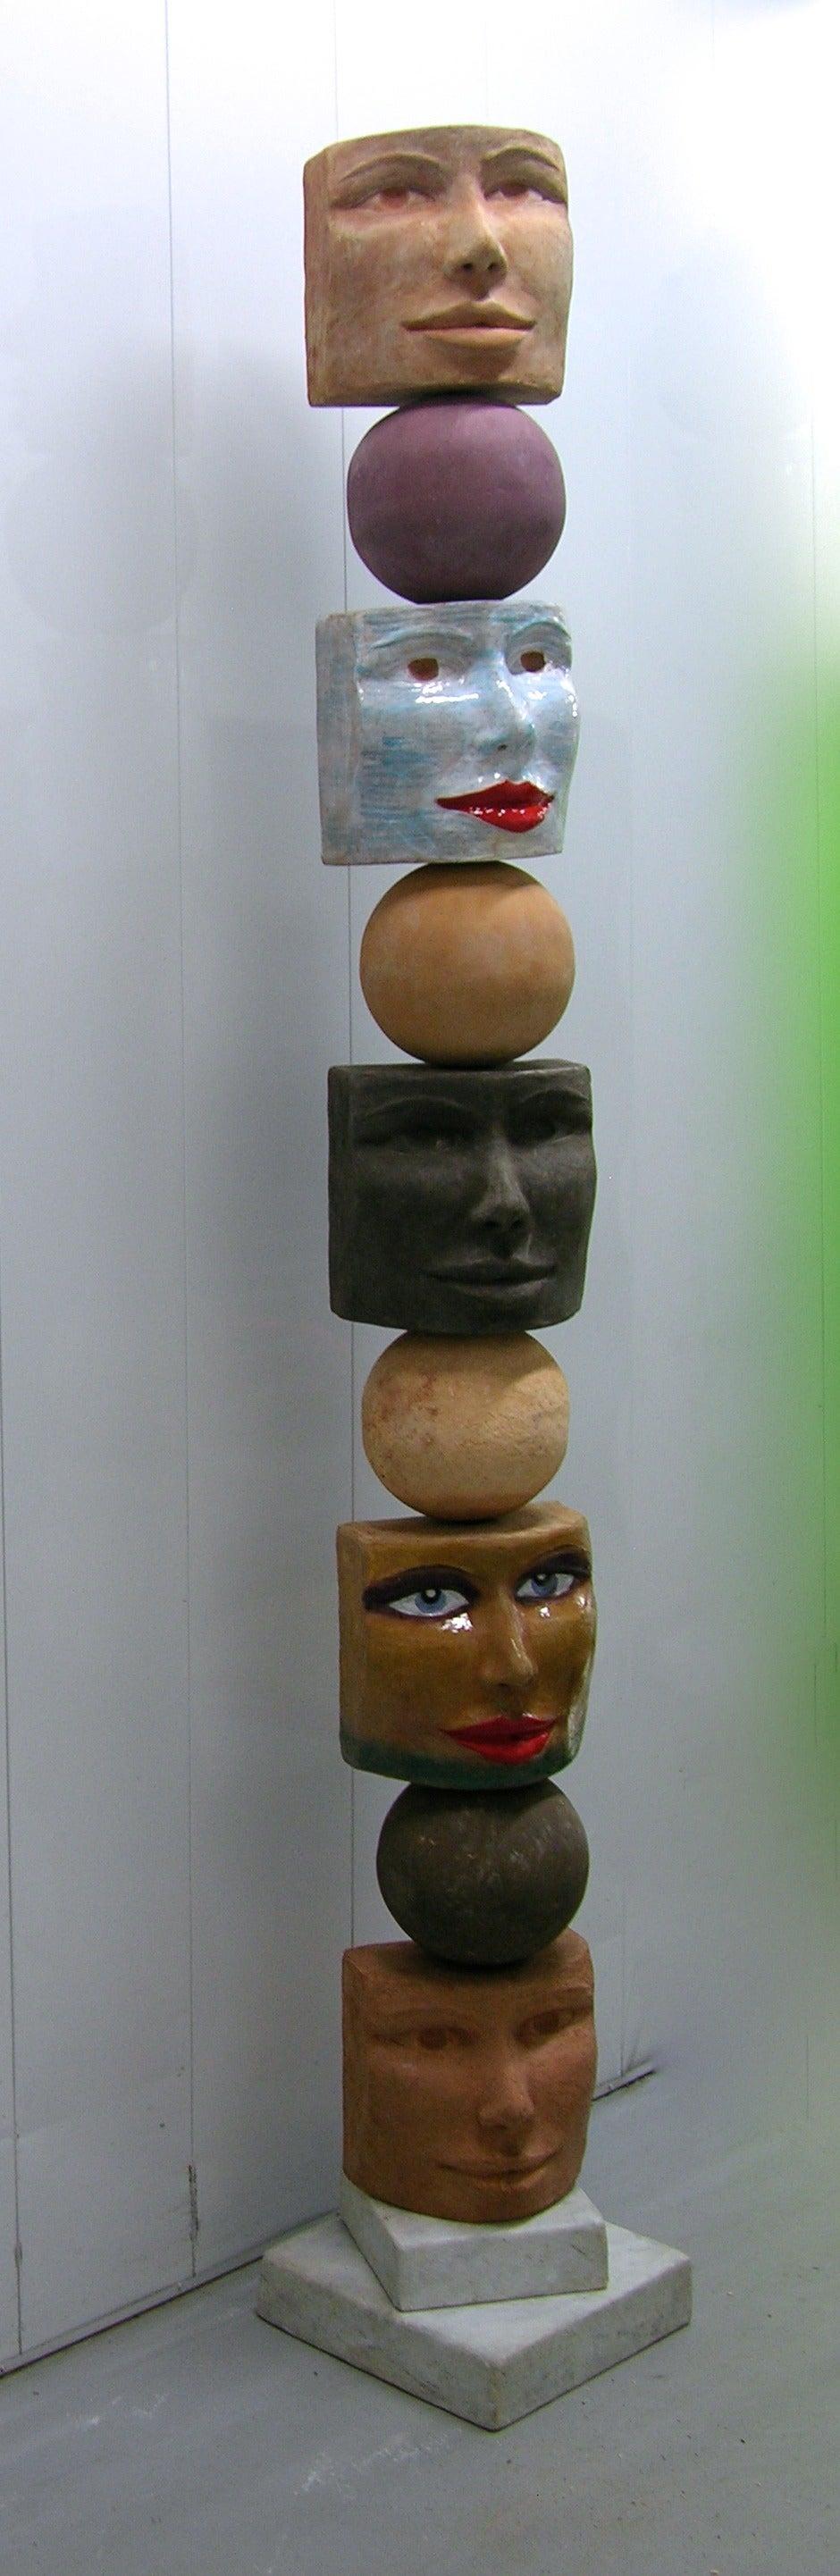 TOTEM Contemporary Italian Organic Pastel Enamel Figural Sculpture in Terracotta For Sale 4